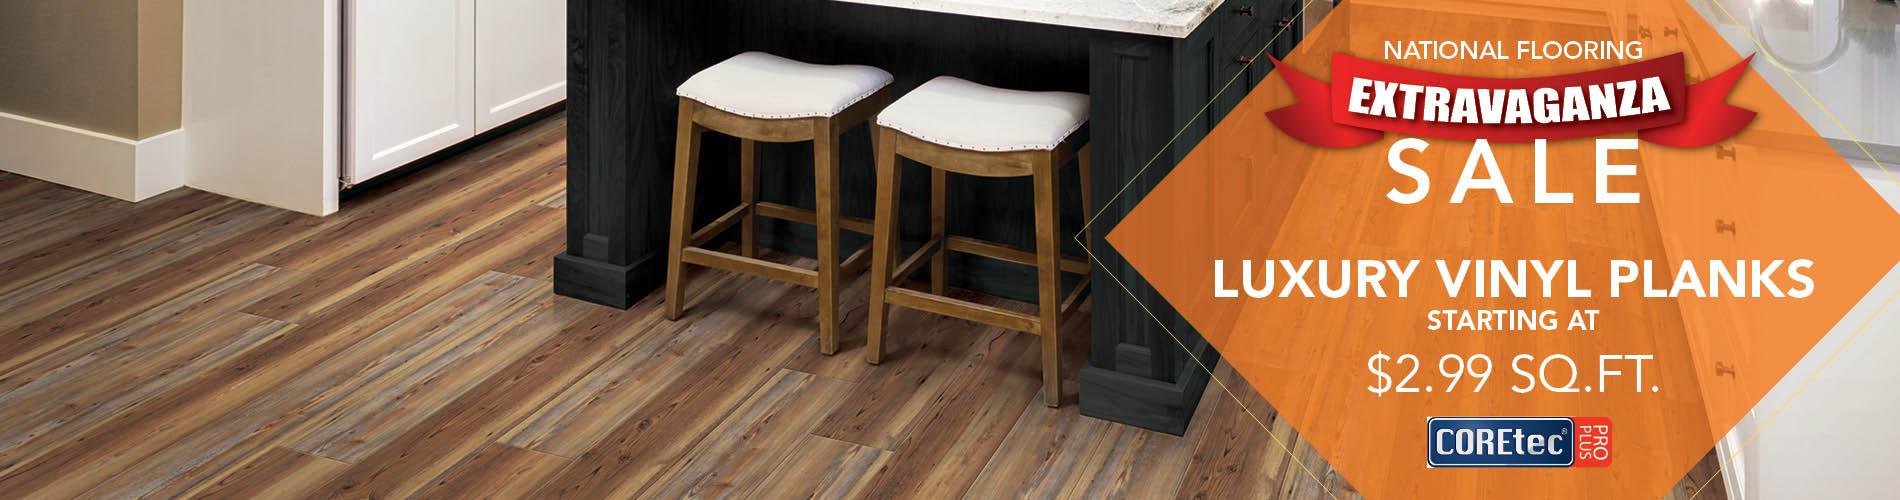 Bk Flooring Floors To Go Evansville In 47715